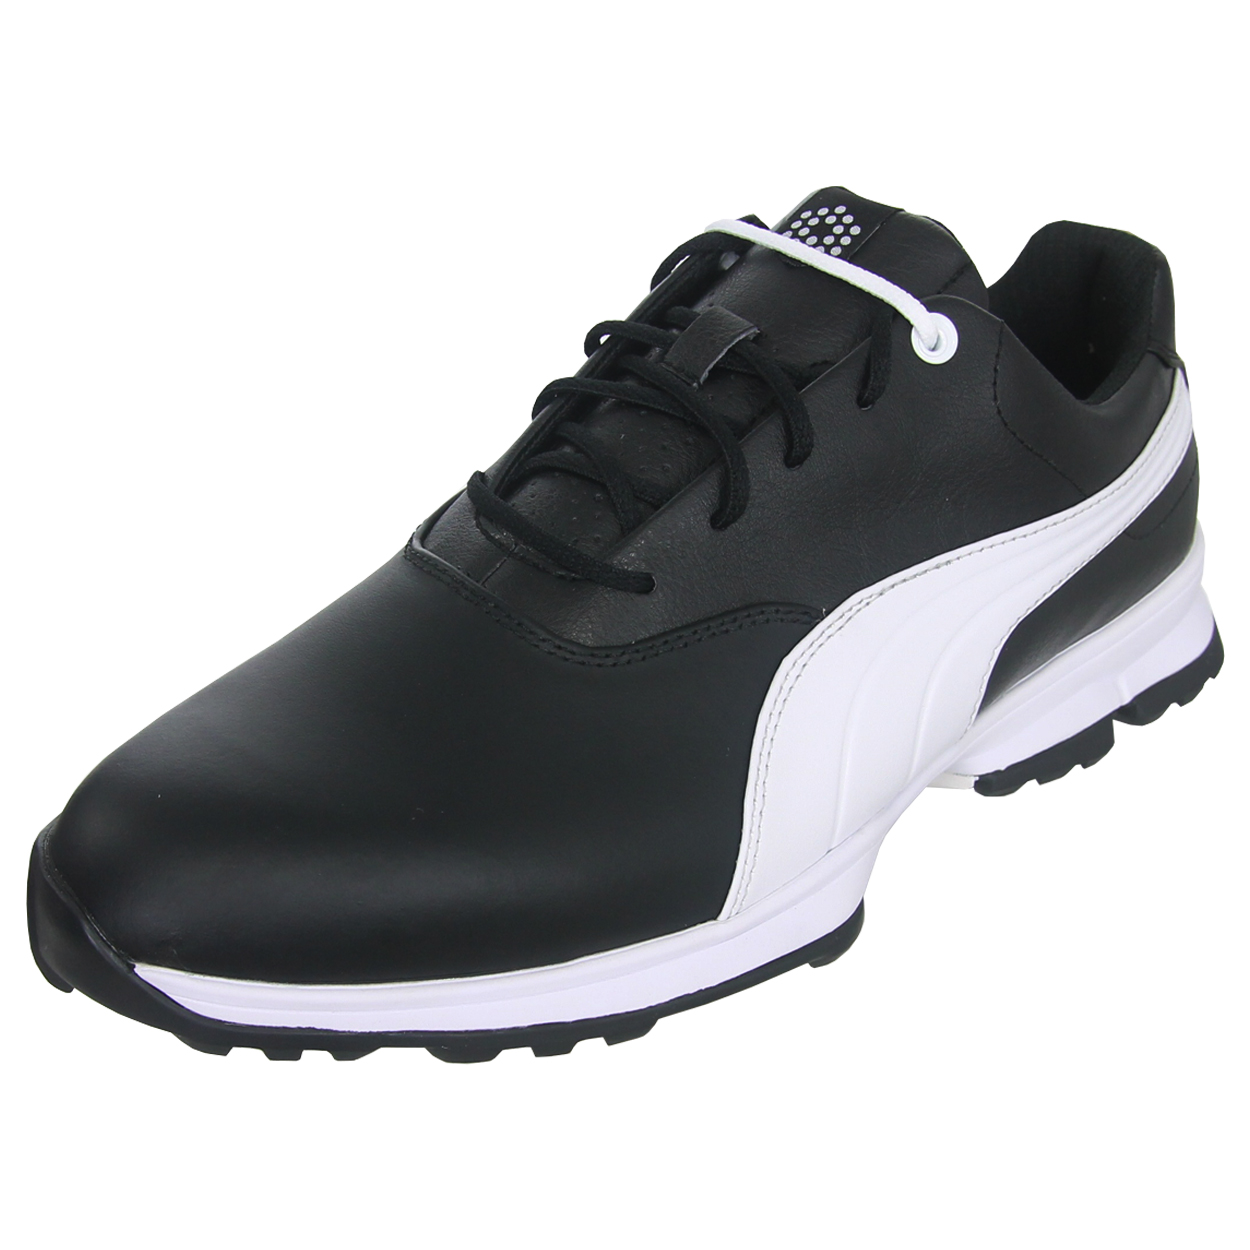 PUMA Ace Men's Leather Waterproof Golf Shoe, Brand NEW ...